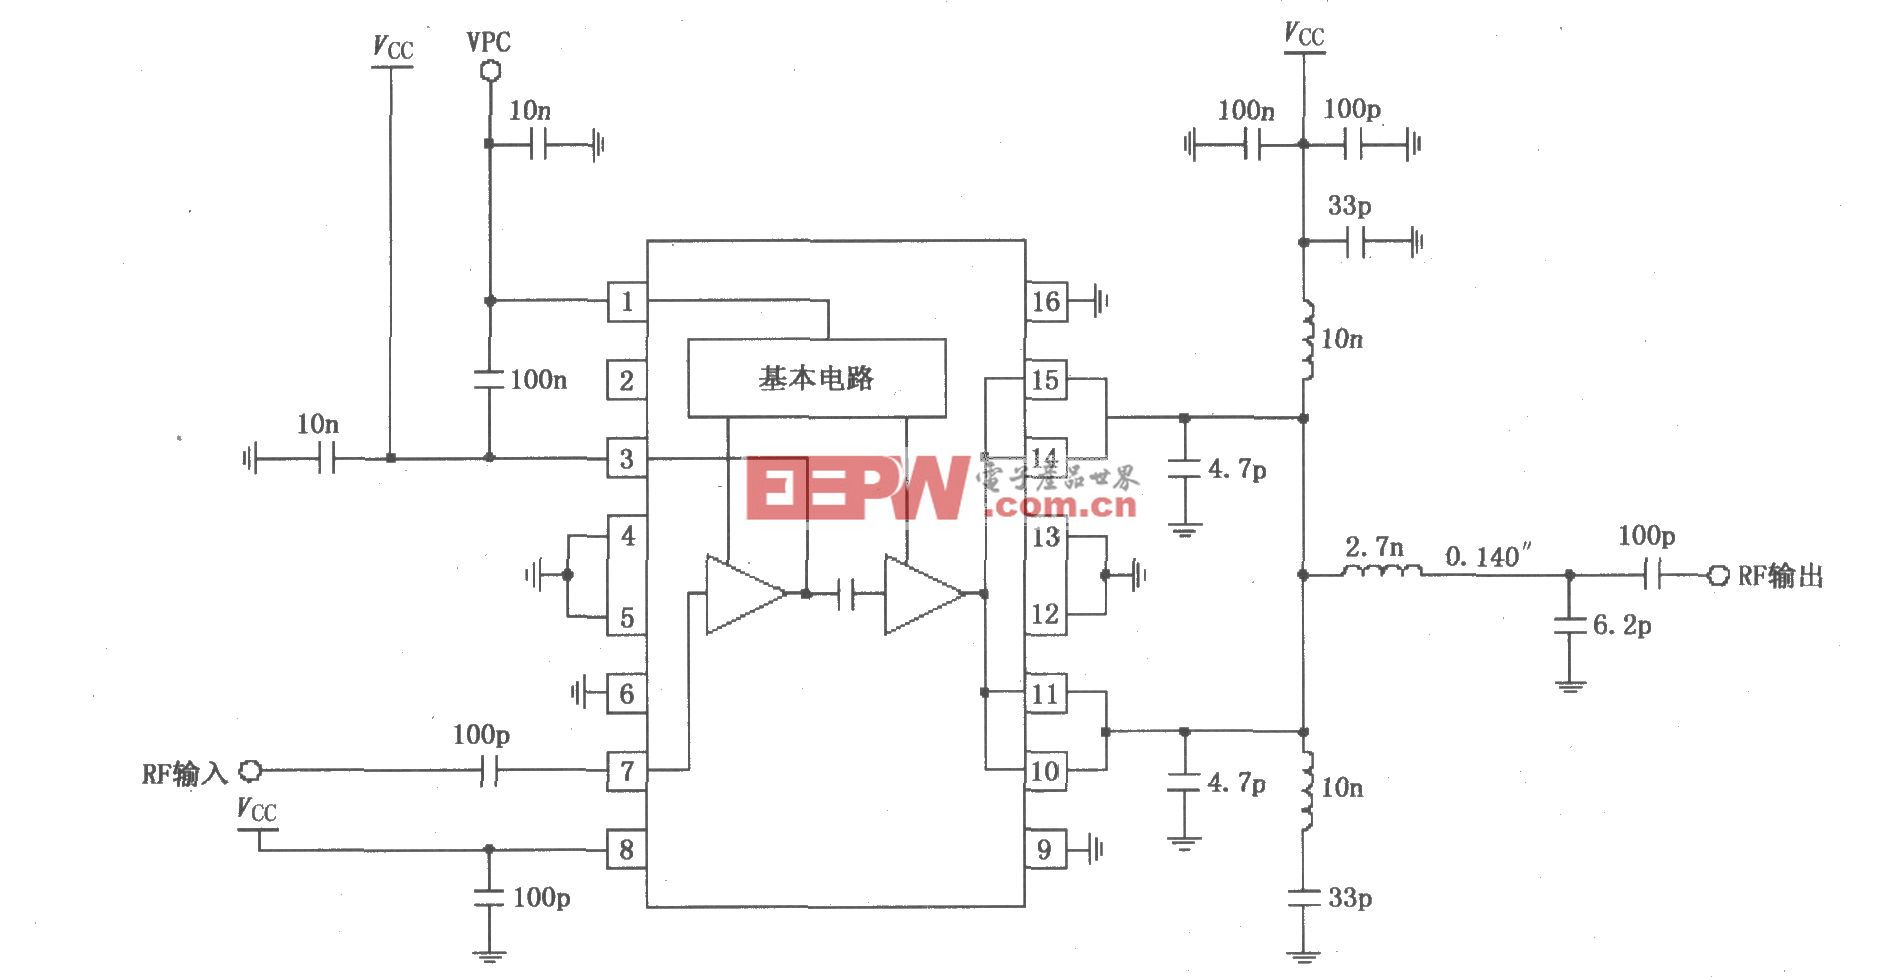 RF2131在4.0~4.8V電源供電時獲得最佳功率和效率放大器電路